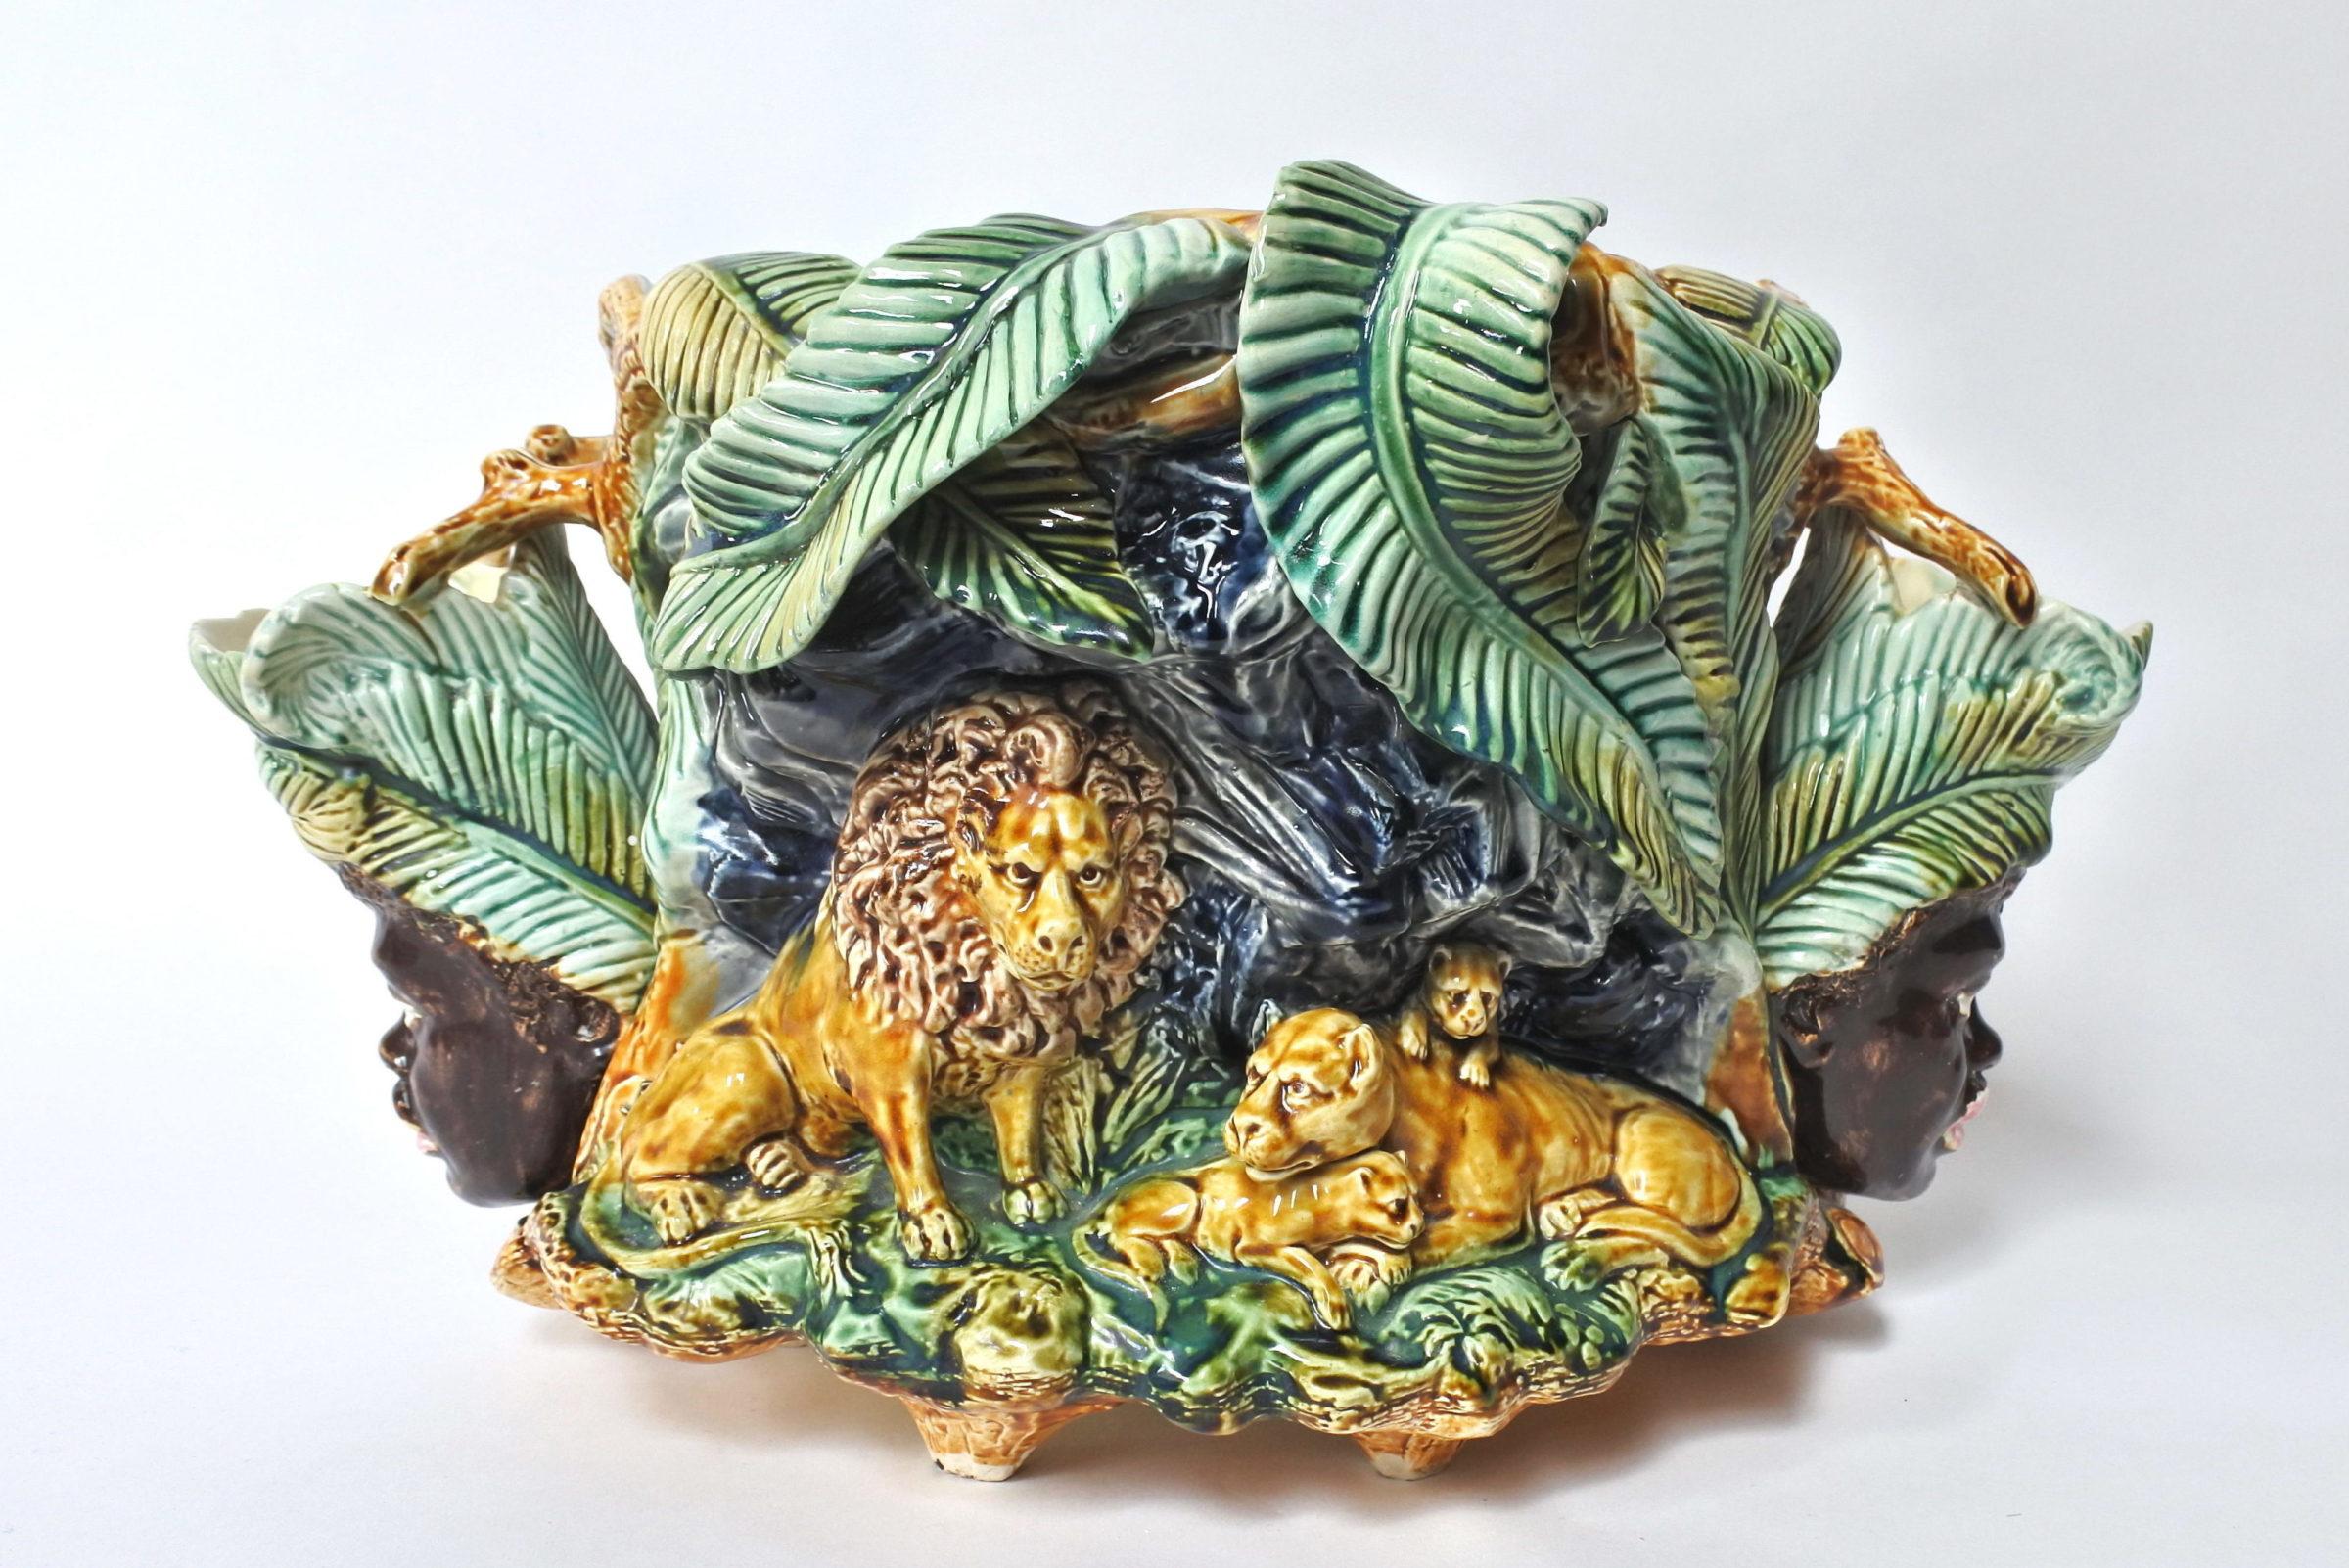 Centrotavola in ceramica barbotine con funzione di jardinière - Onnaing - 5